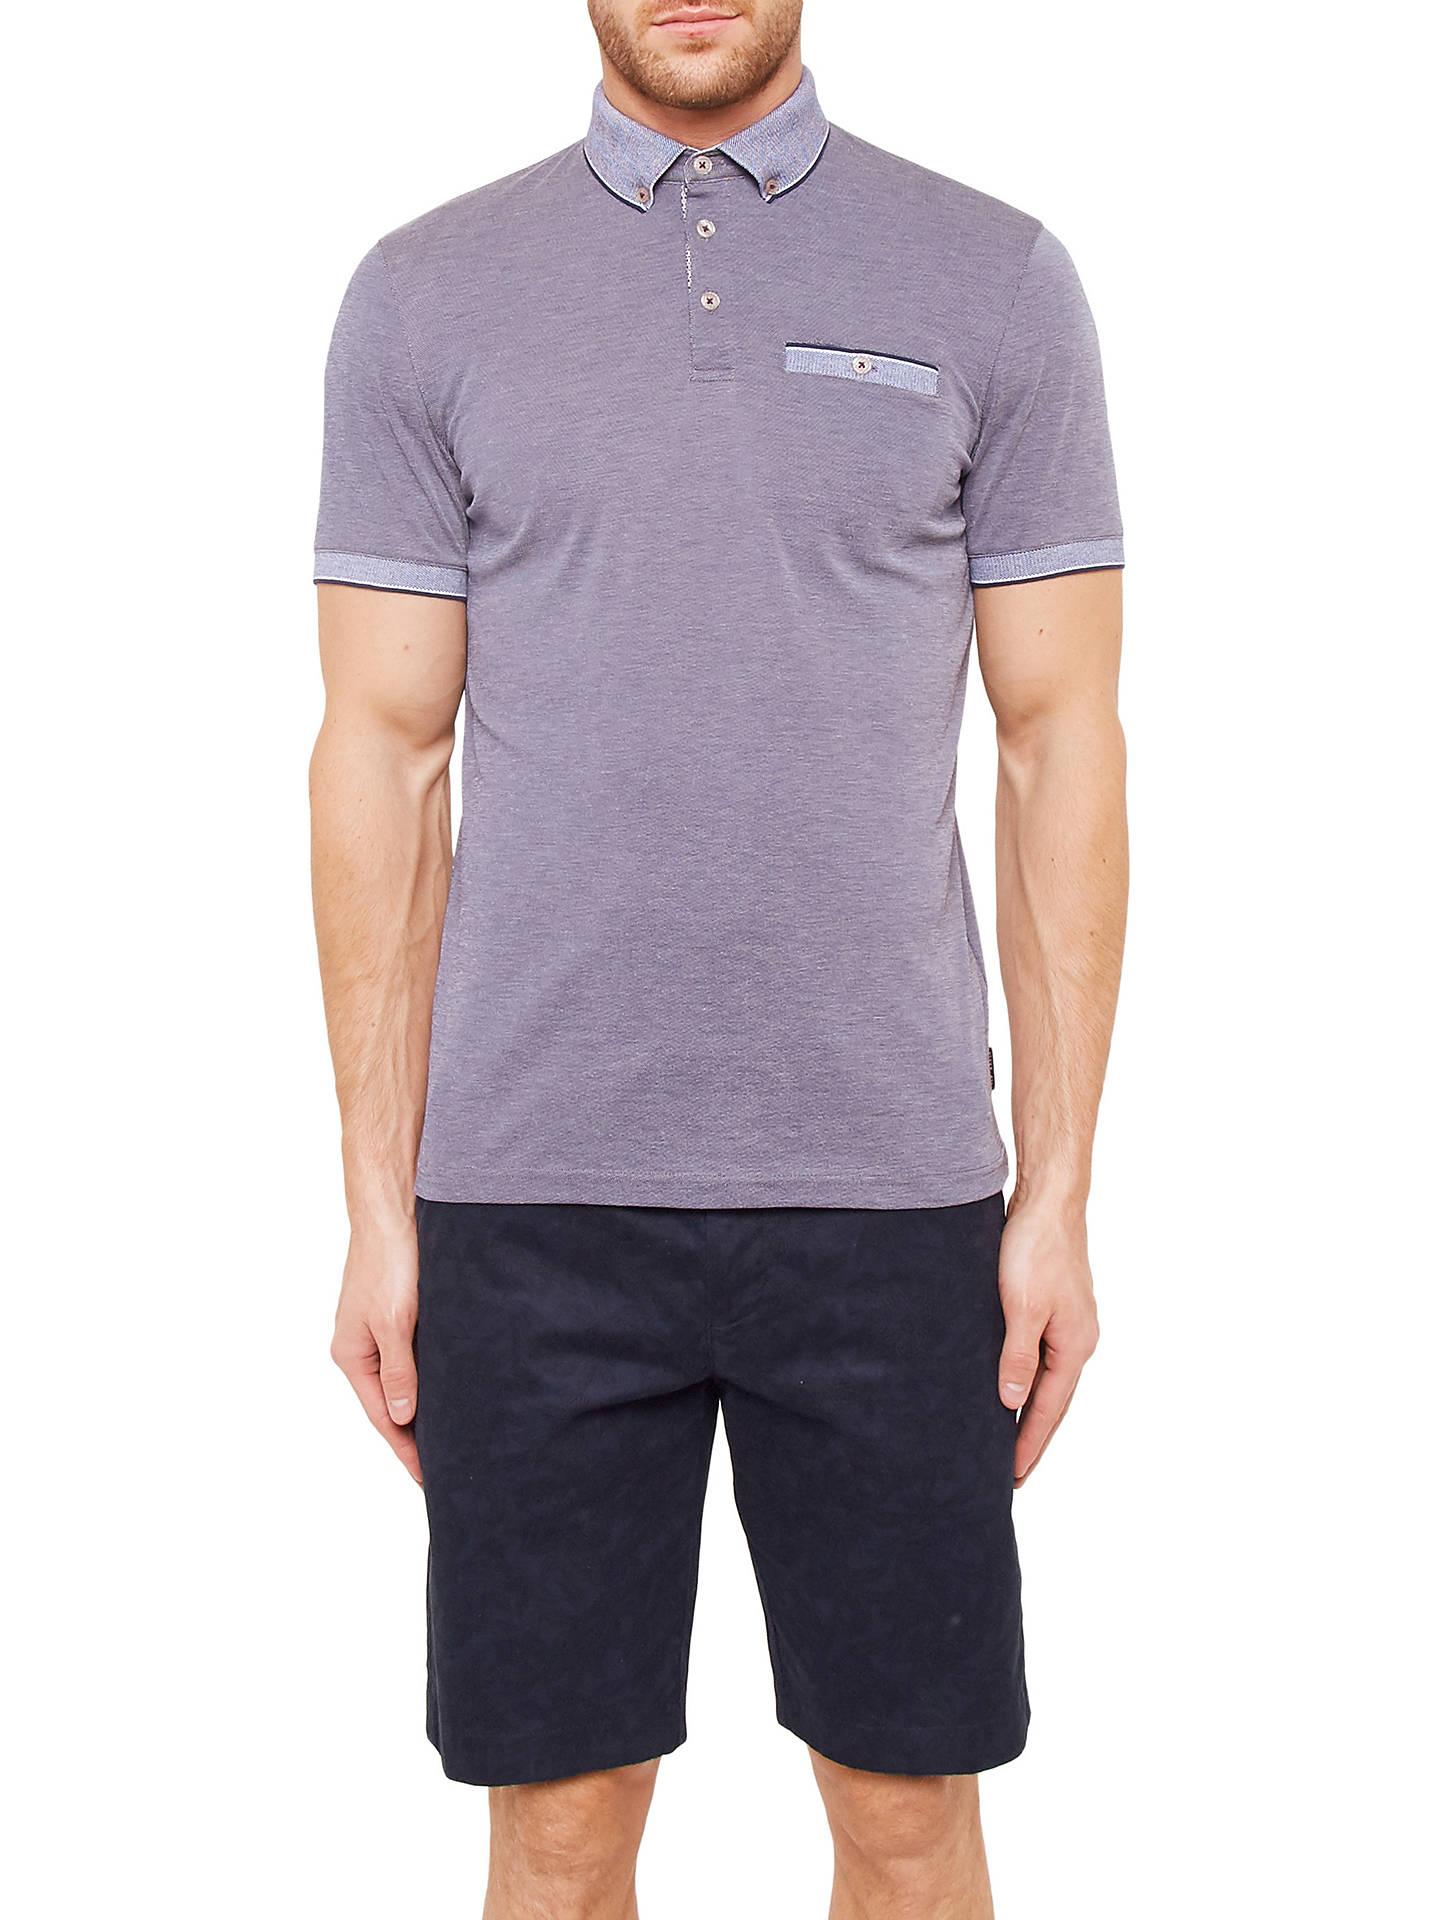 65a04e9e23d4e0 Ted Baker Shapiro Oxford Flat-Knit Polo Shirt at John Lewis   Partners